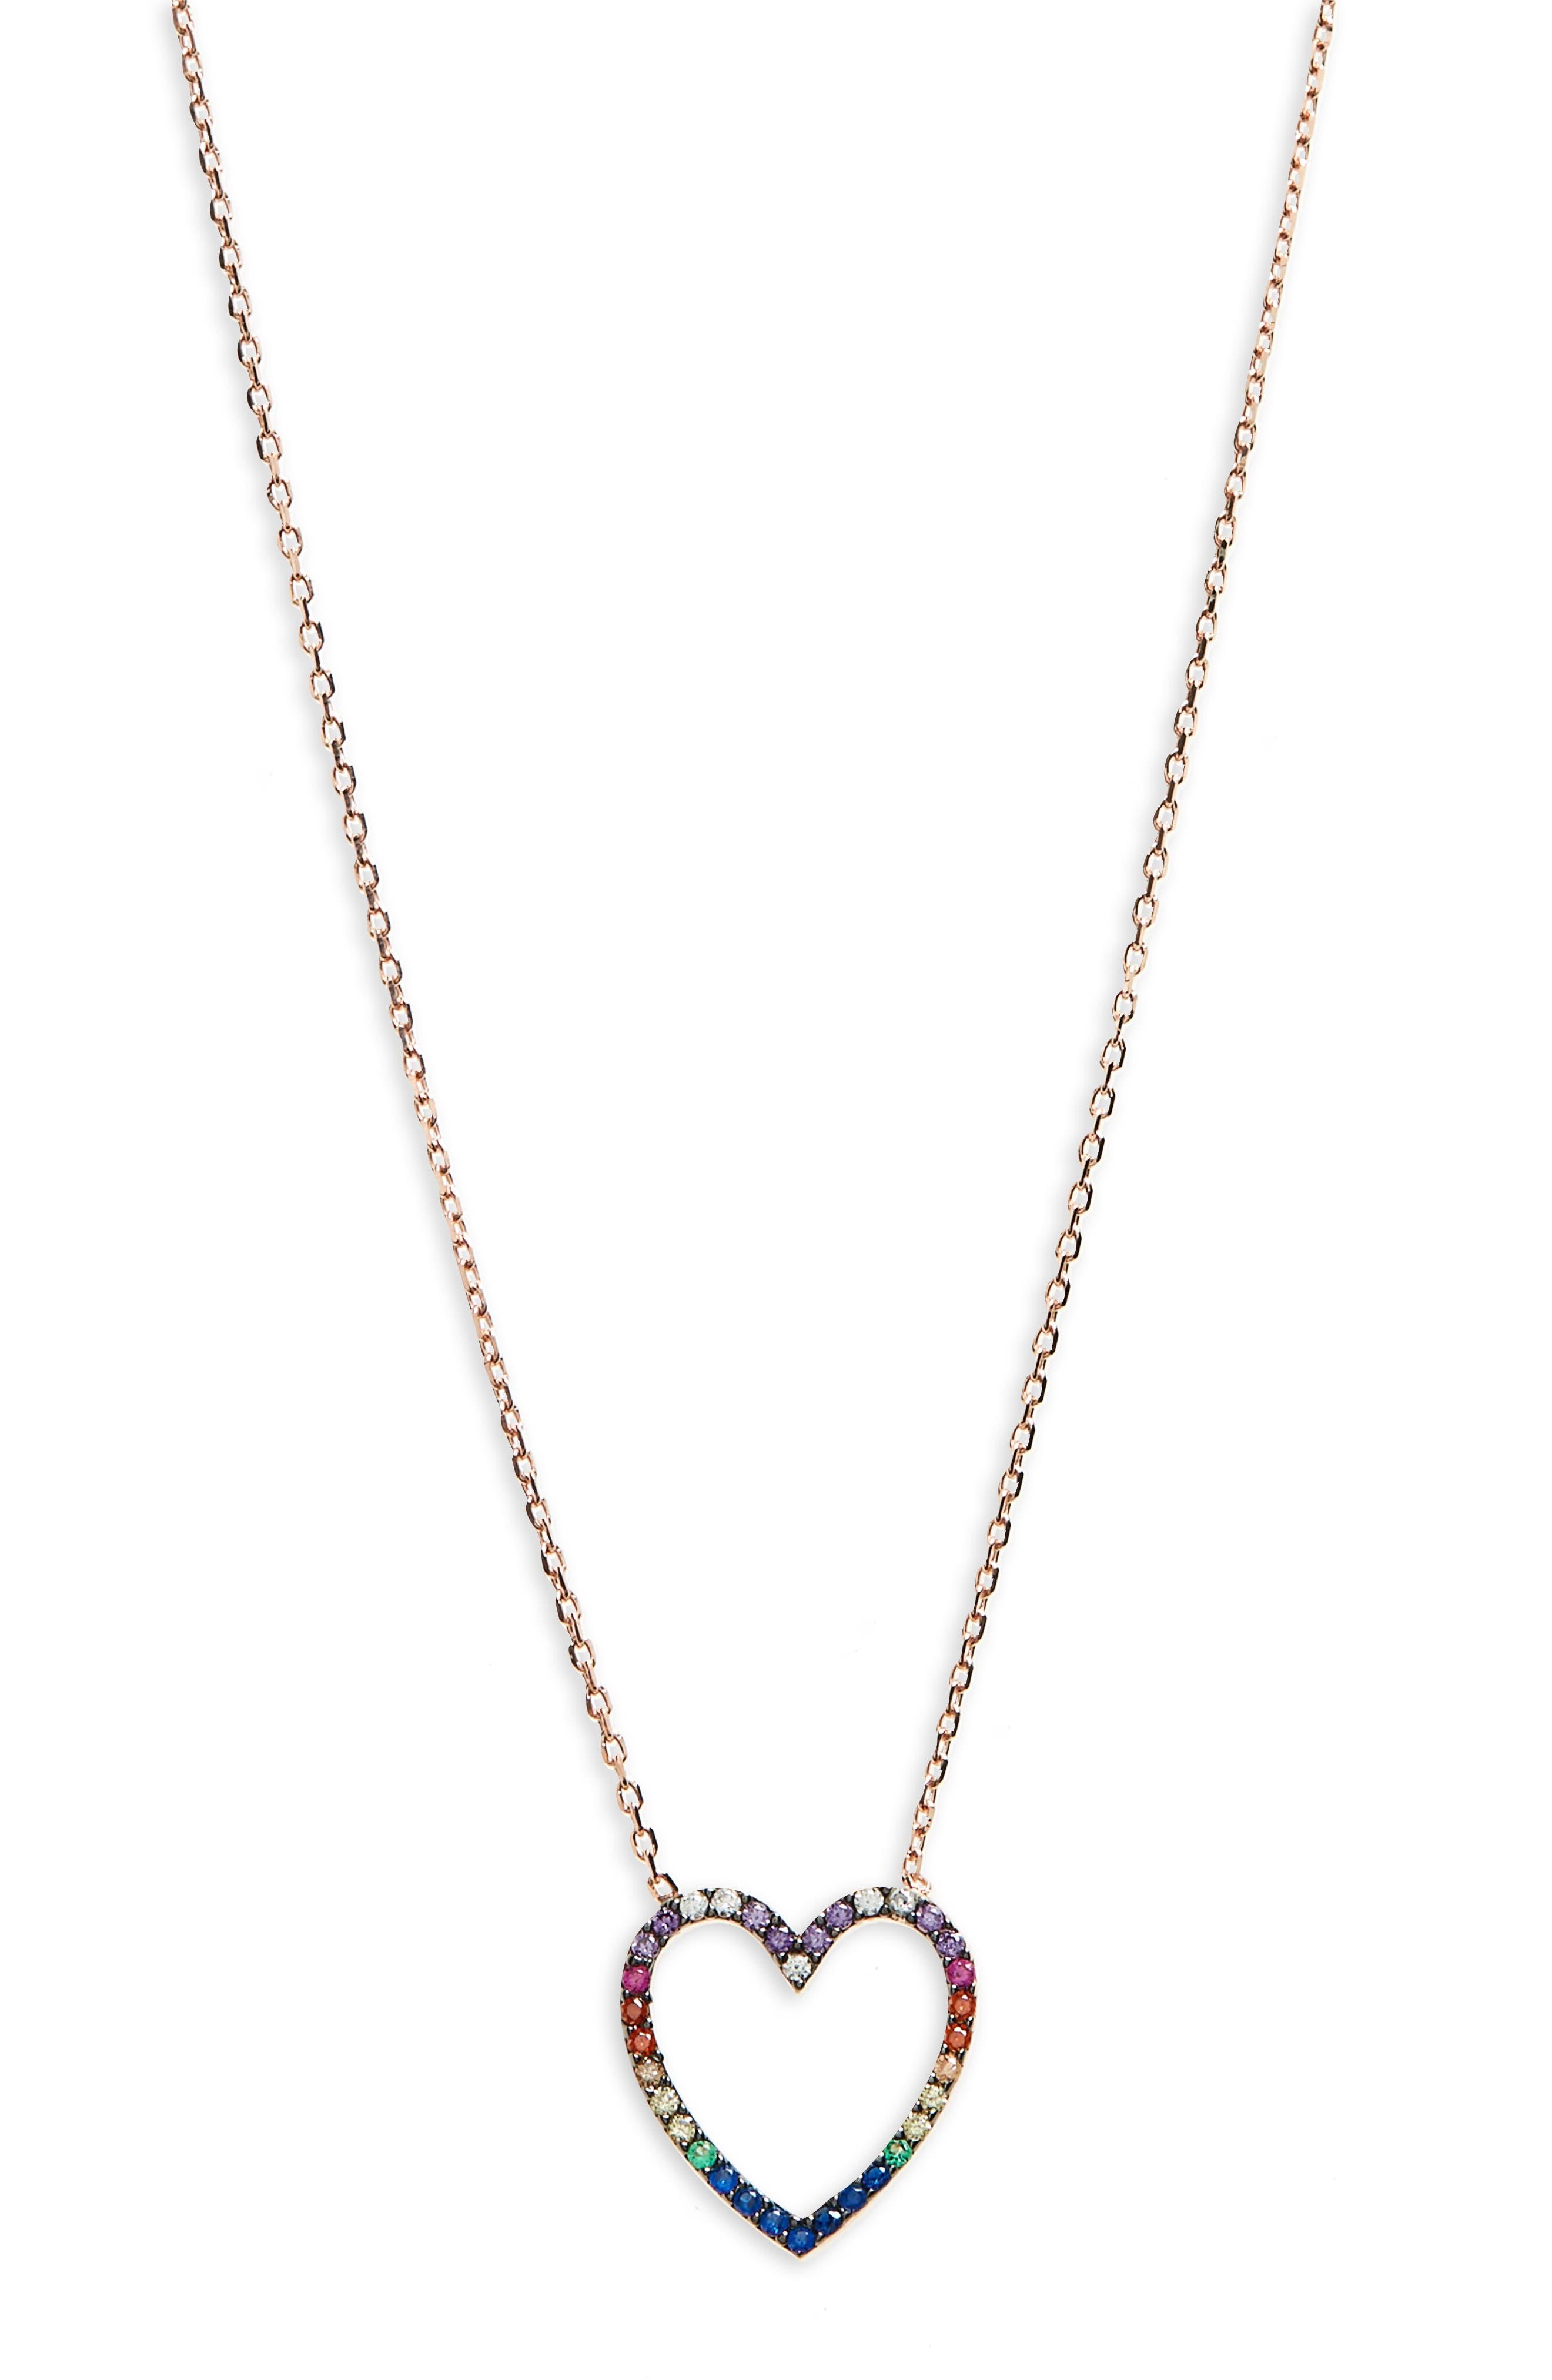 Rainbow Heart Pendant Necklace,                             Main thumbnail 1, color,                             710